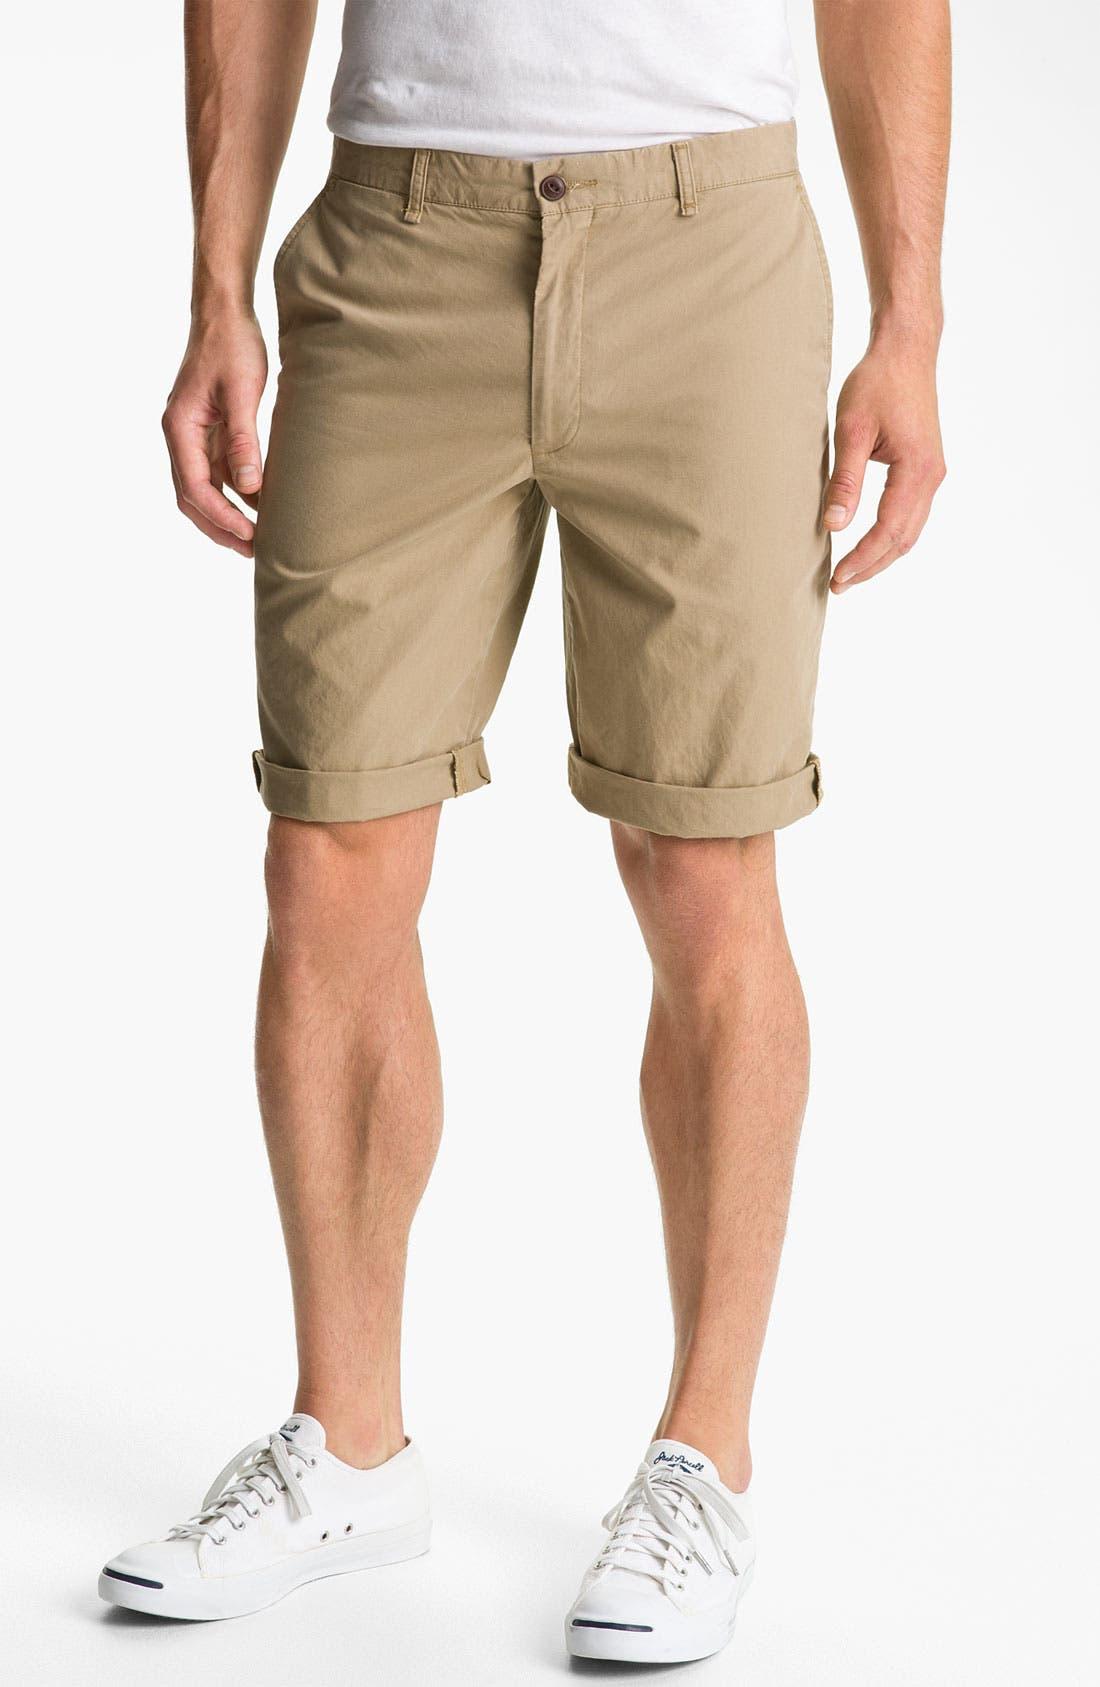 Alternate Image 1 Selected - Dockers® Flat Front Shorts